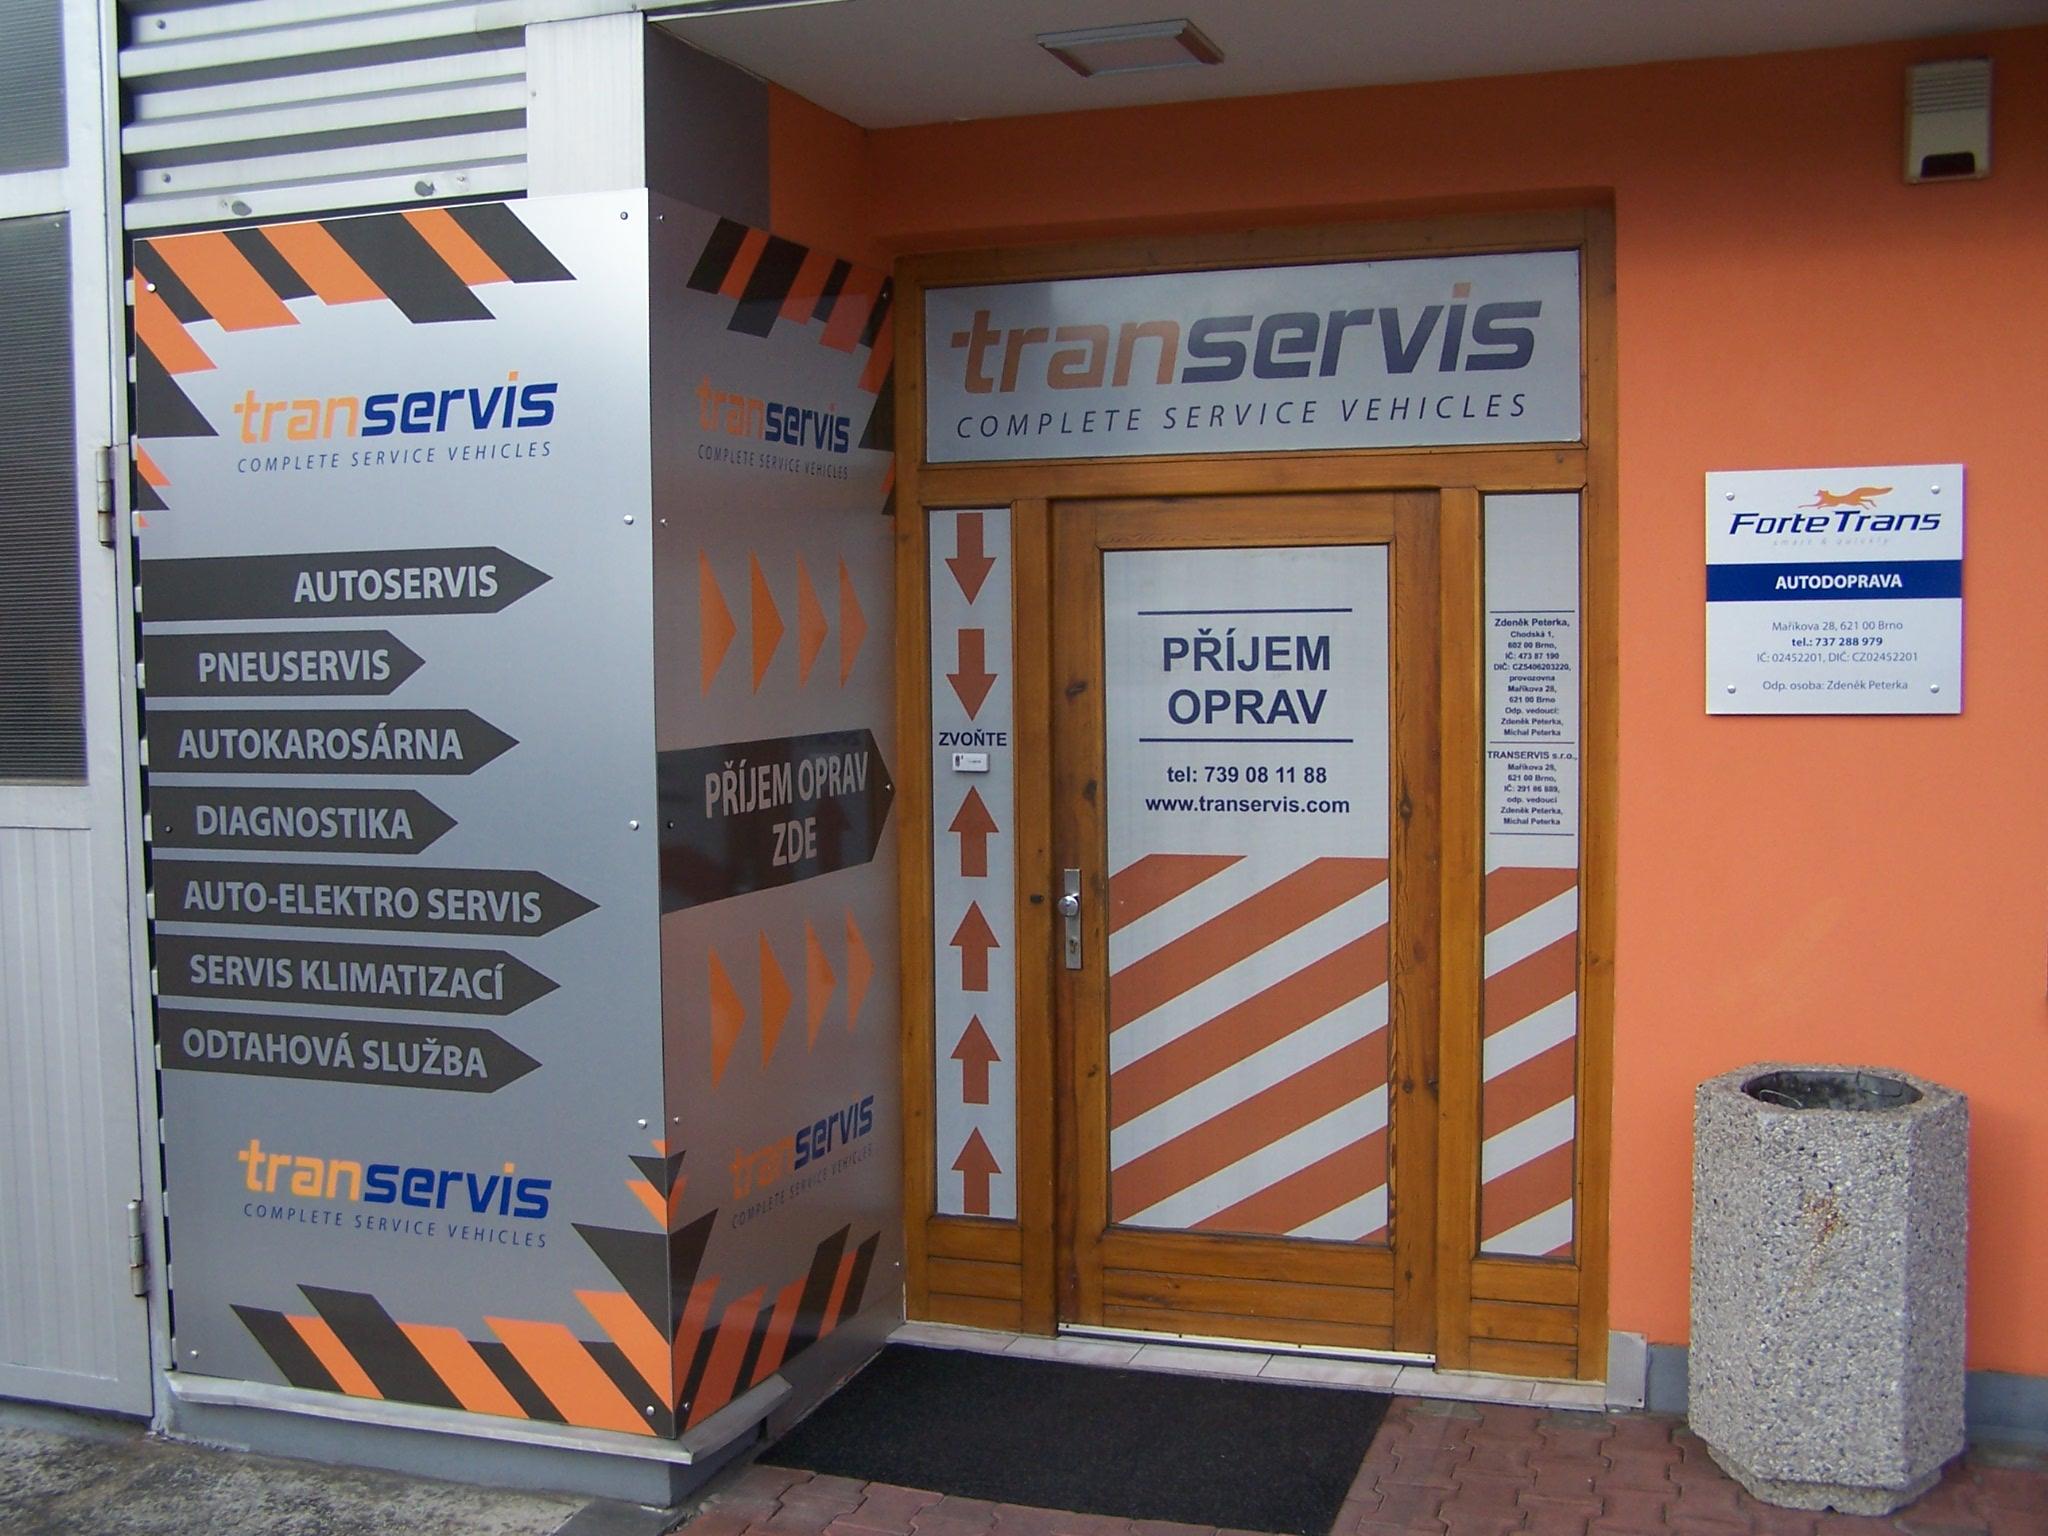 http://www.cesko-katalog.cz/galerie/transervis-s-r-o-1427384564.